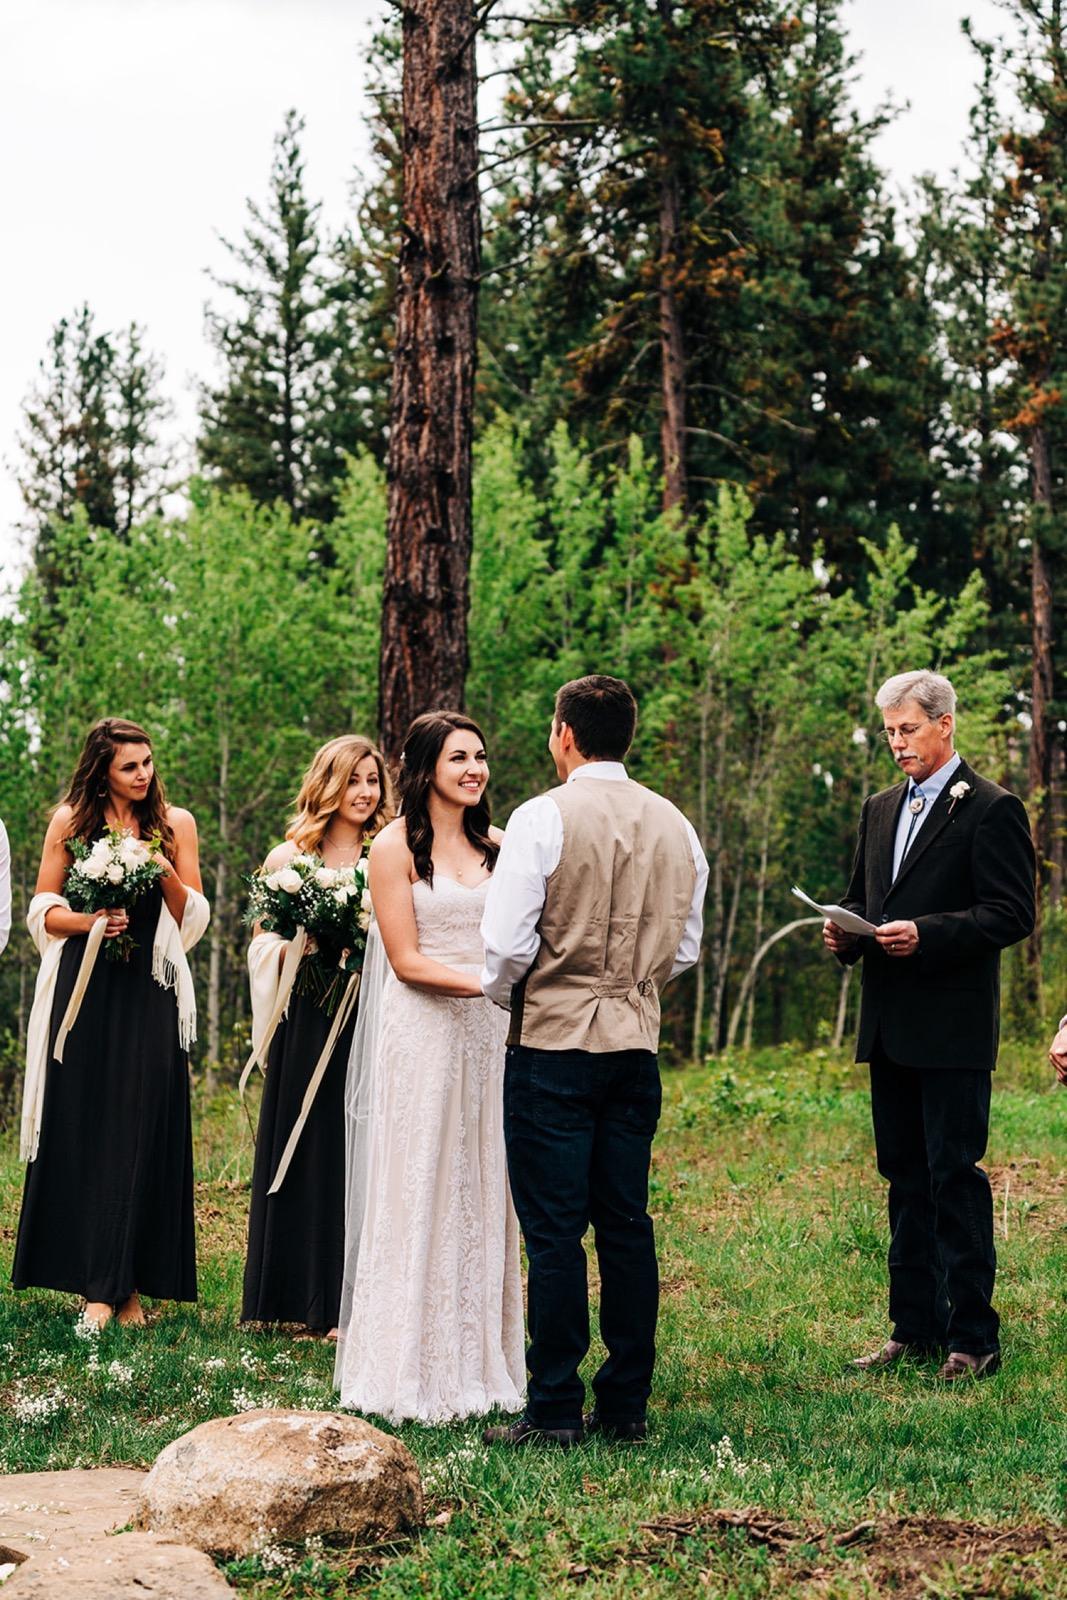 047_katie_chris_wedding-100.jpg